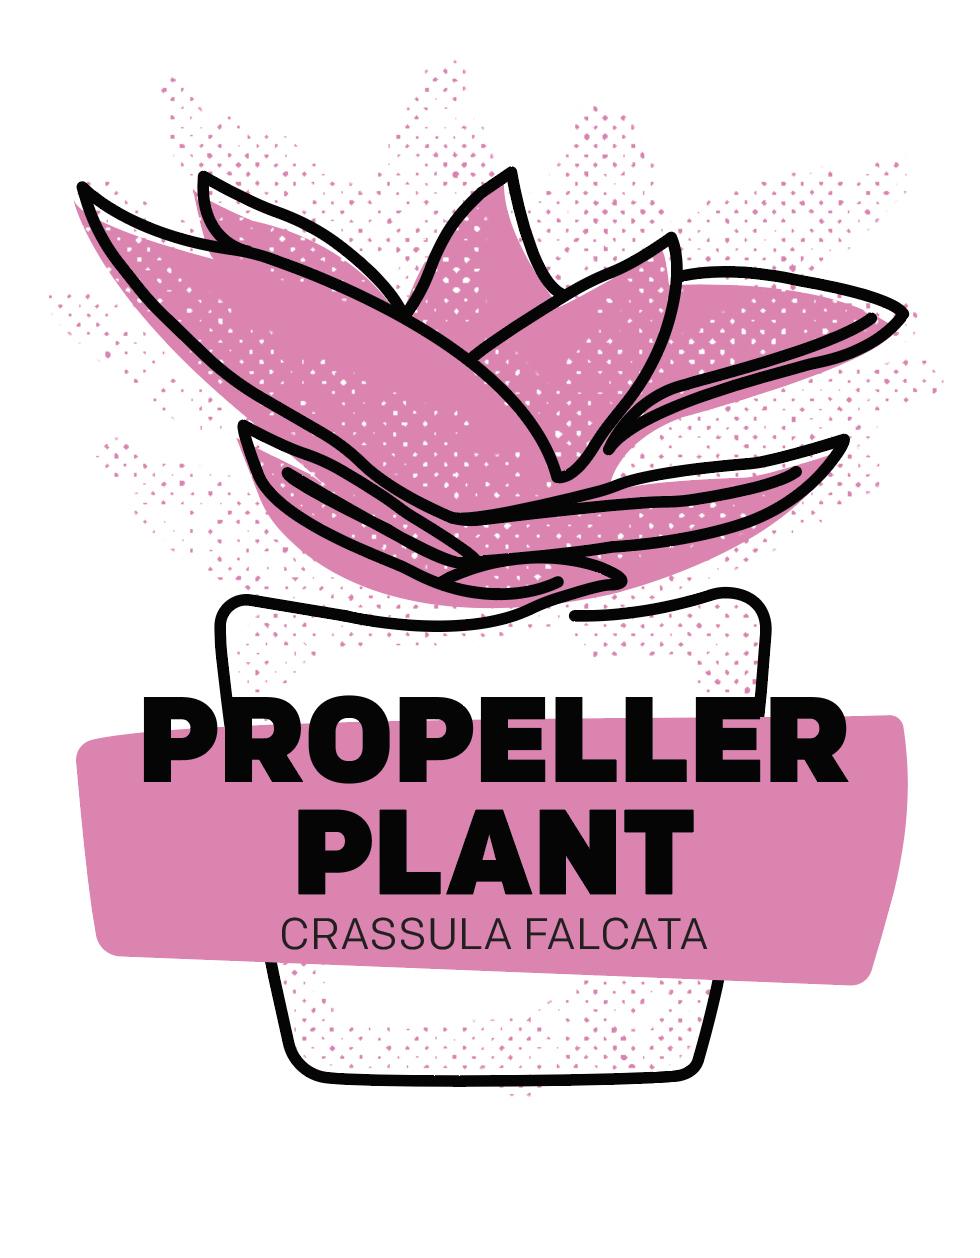 Propeller Plant